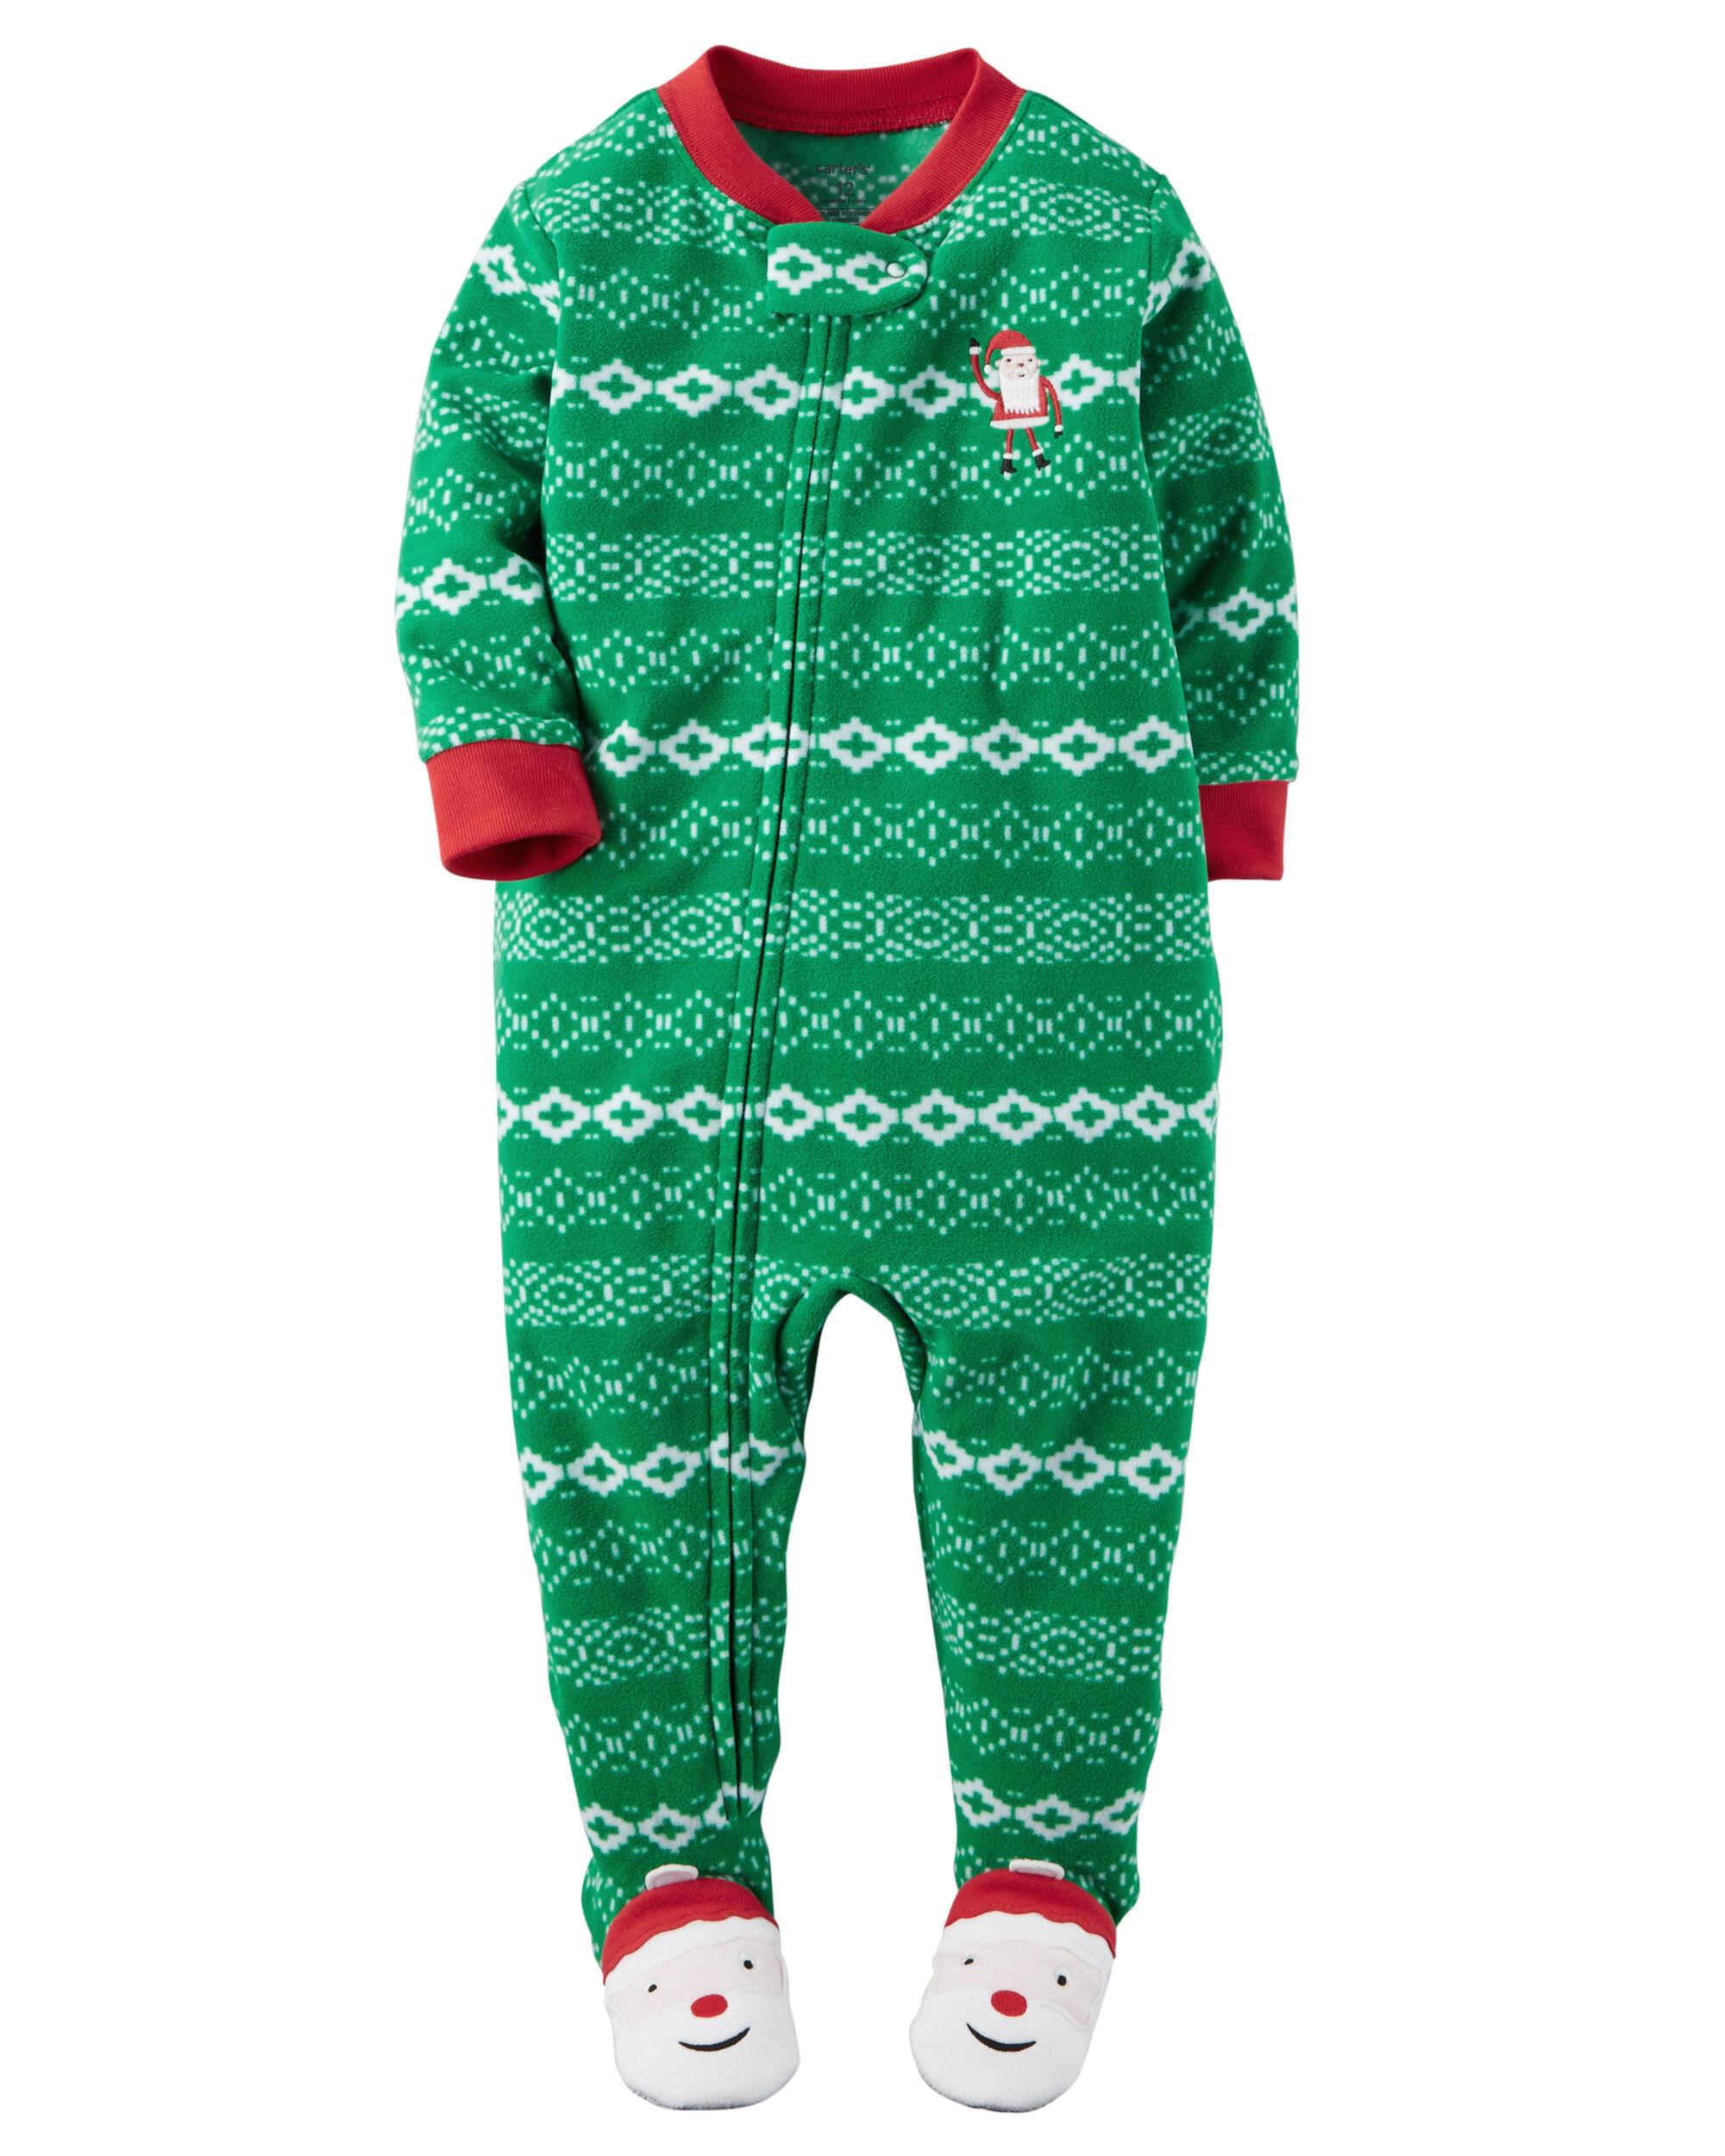 1-Piece Fleece Christmas PJs. Loading zoom